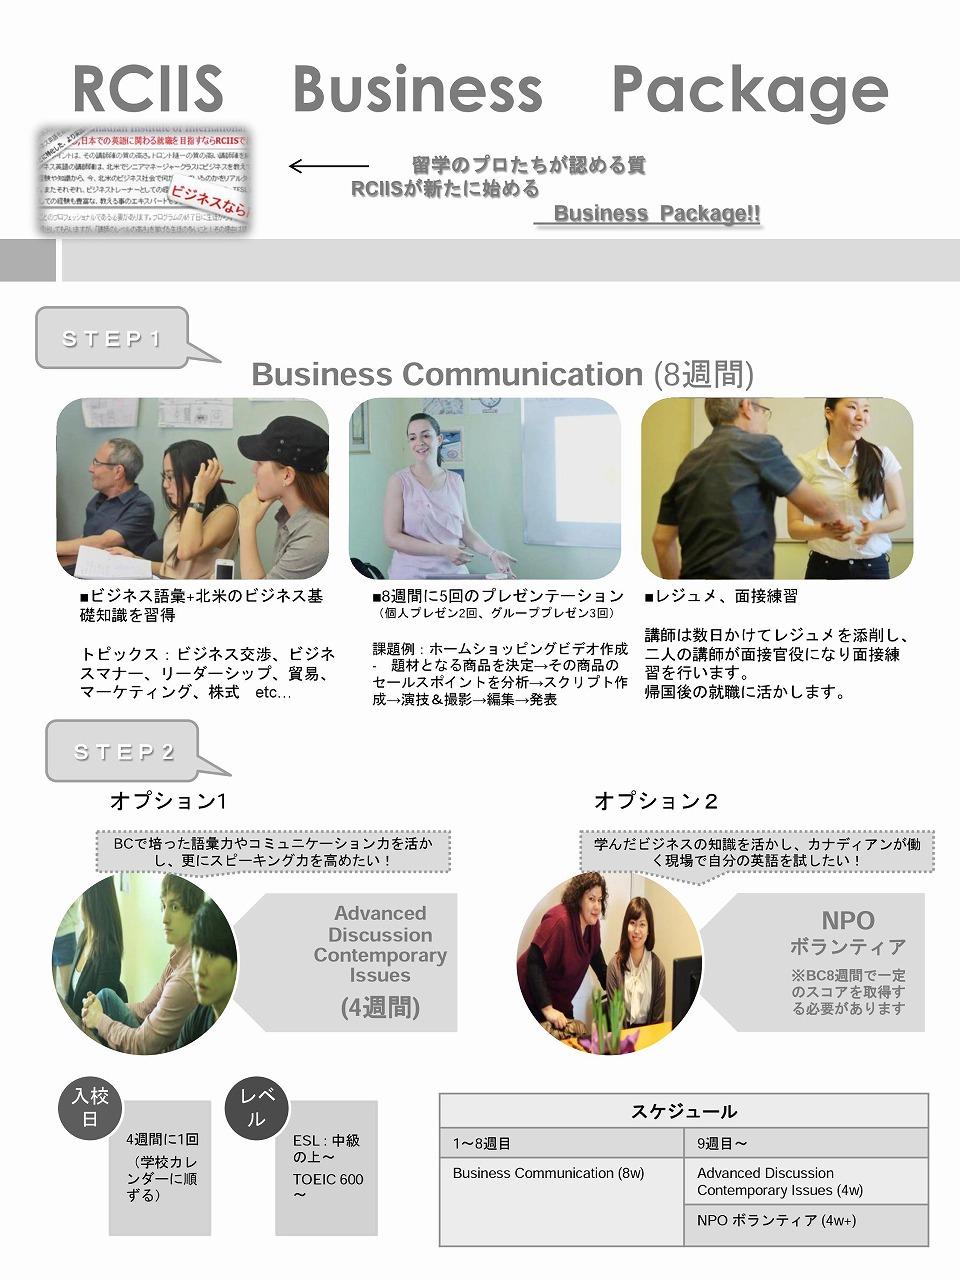 canada-ryugaku-toronto-esl-rciis-business-package-1